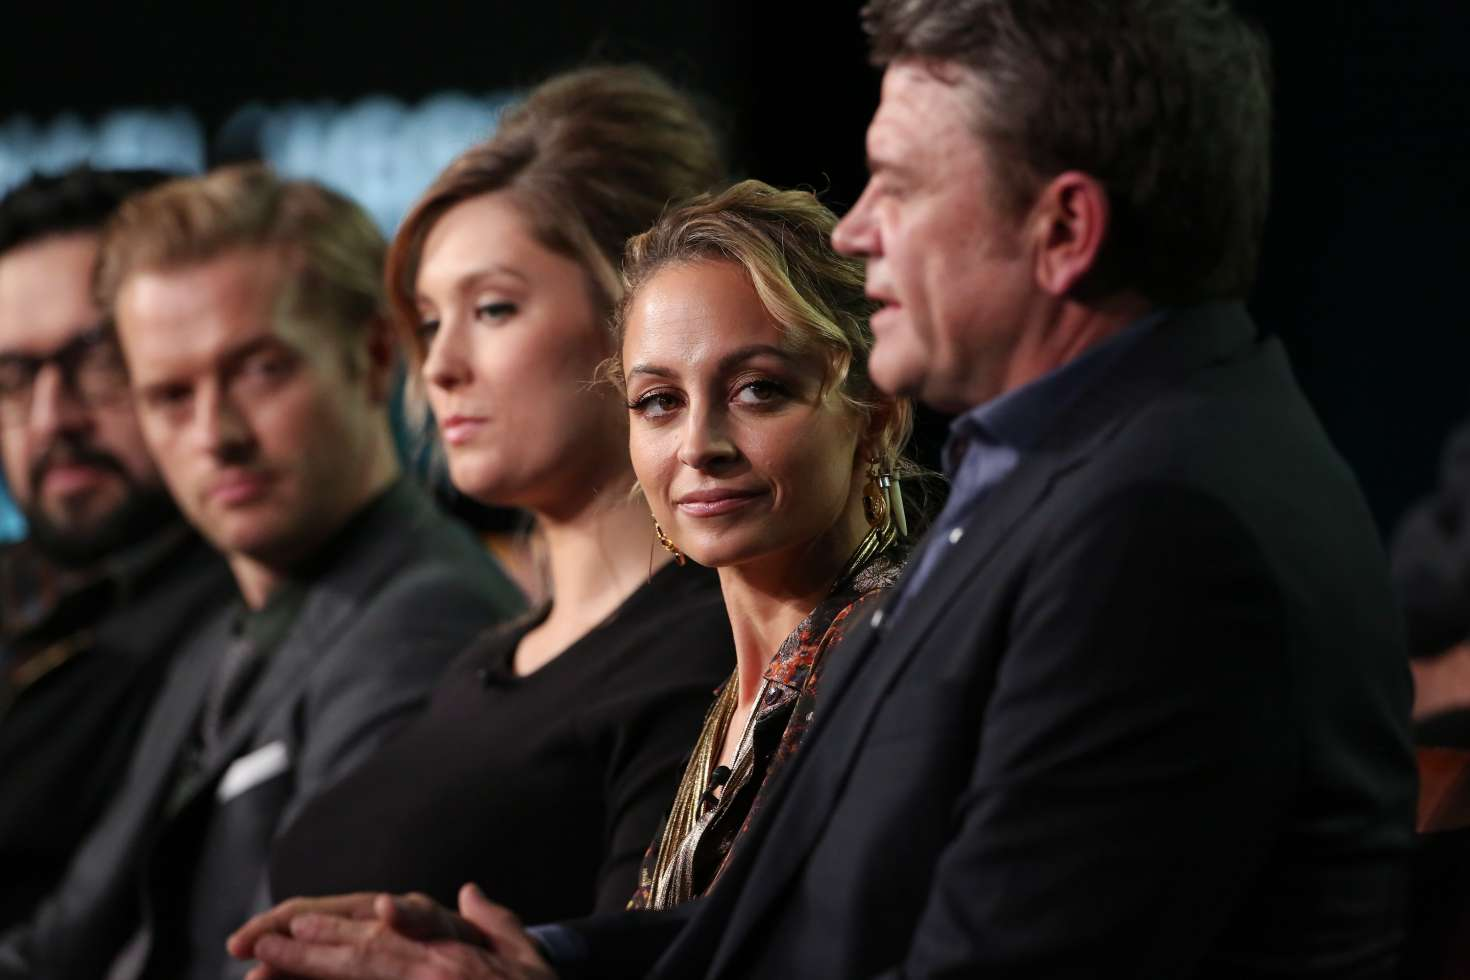 Briga Heelan 2017 : Briga Heelan: Great News Panel at 2017 TCA Winter Press Tour -03